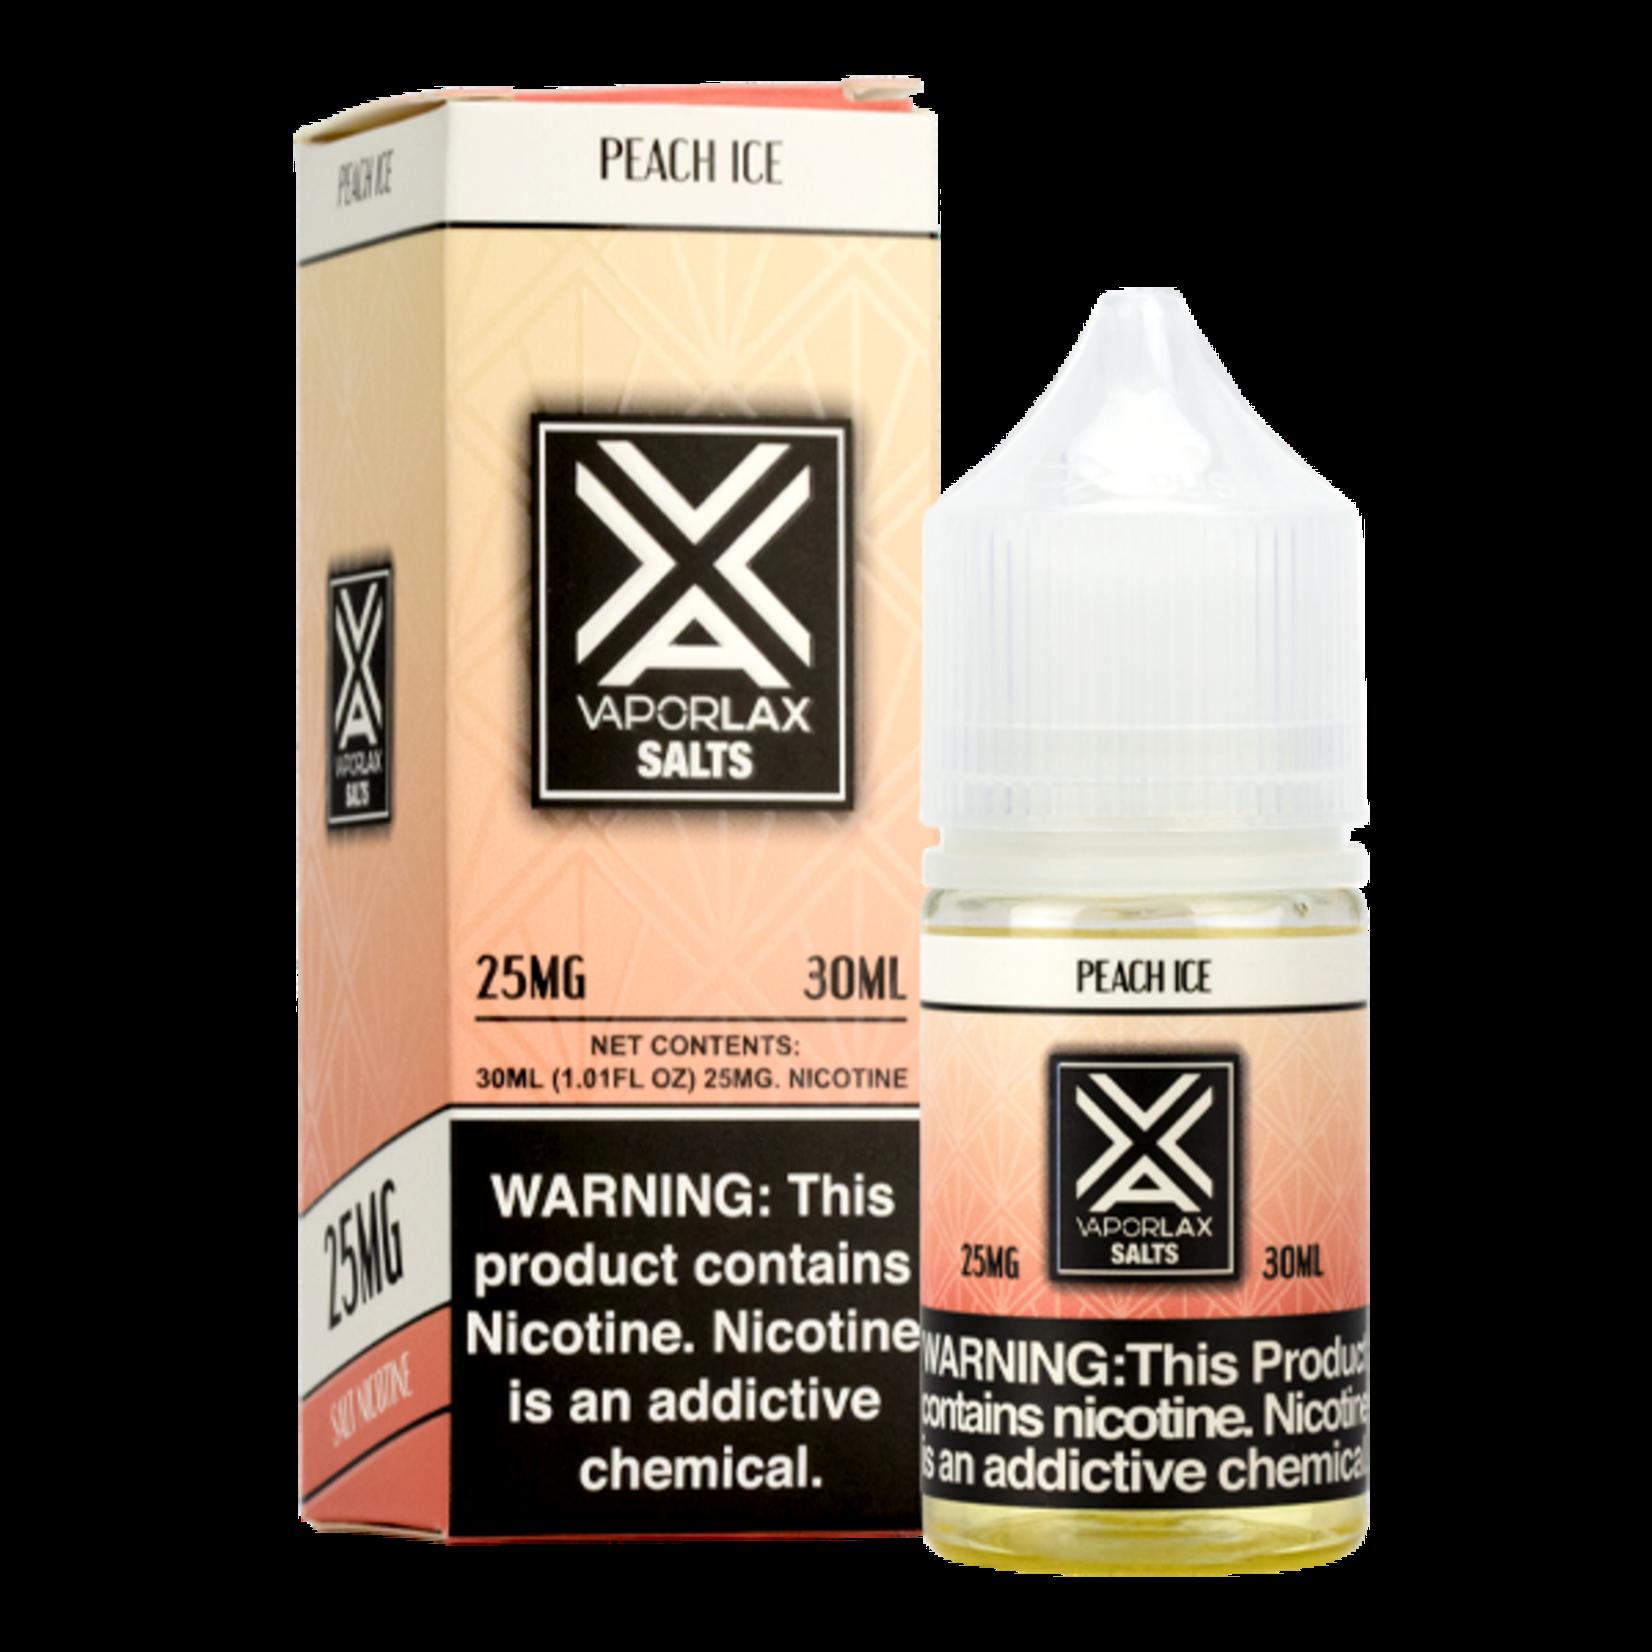 VaporLax Salts Peach Ice Nic Salt